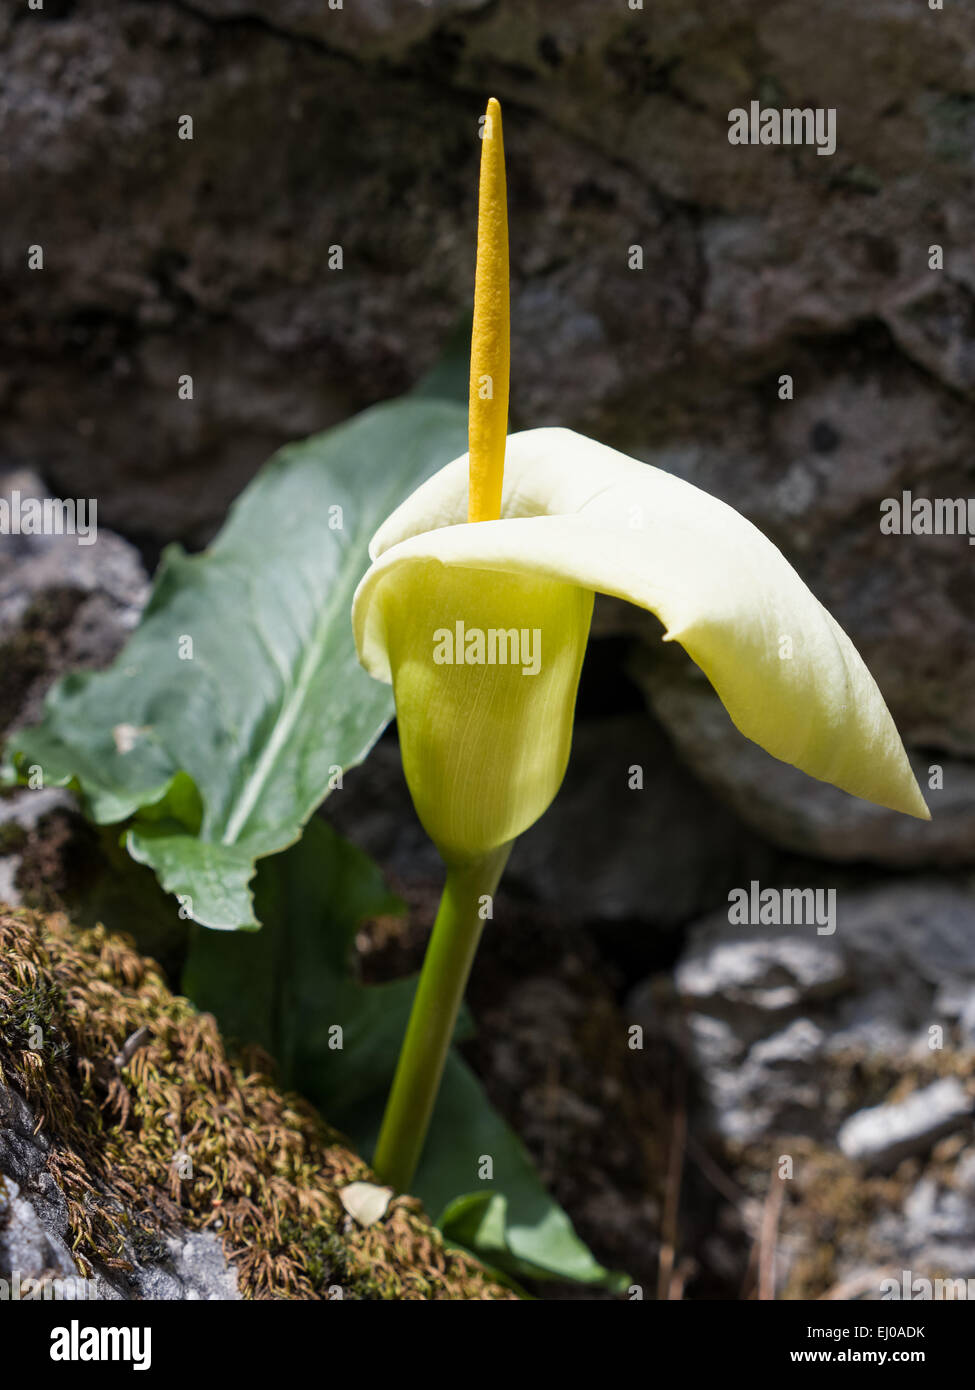 Araceae, arum, Arum creticum, blossom, flourish, flower piston, plant, Monocotyledons, flora, Yellow, piston, Kretischer Stock Photo